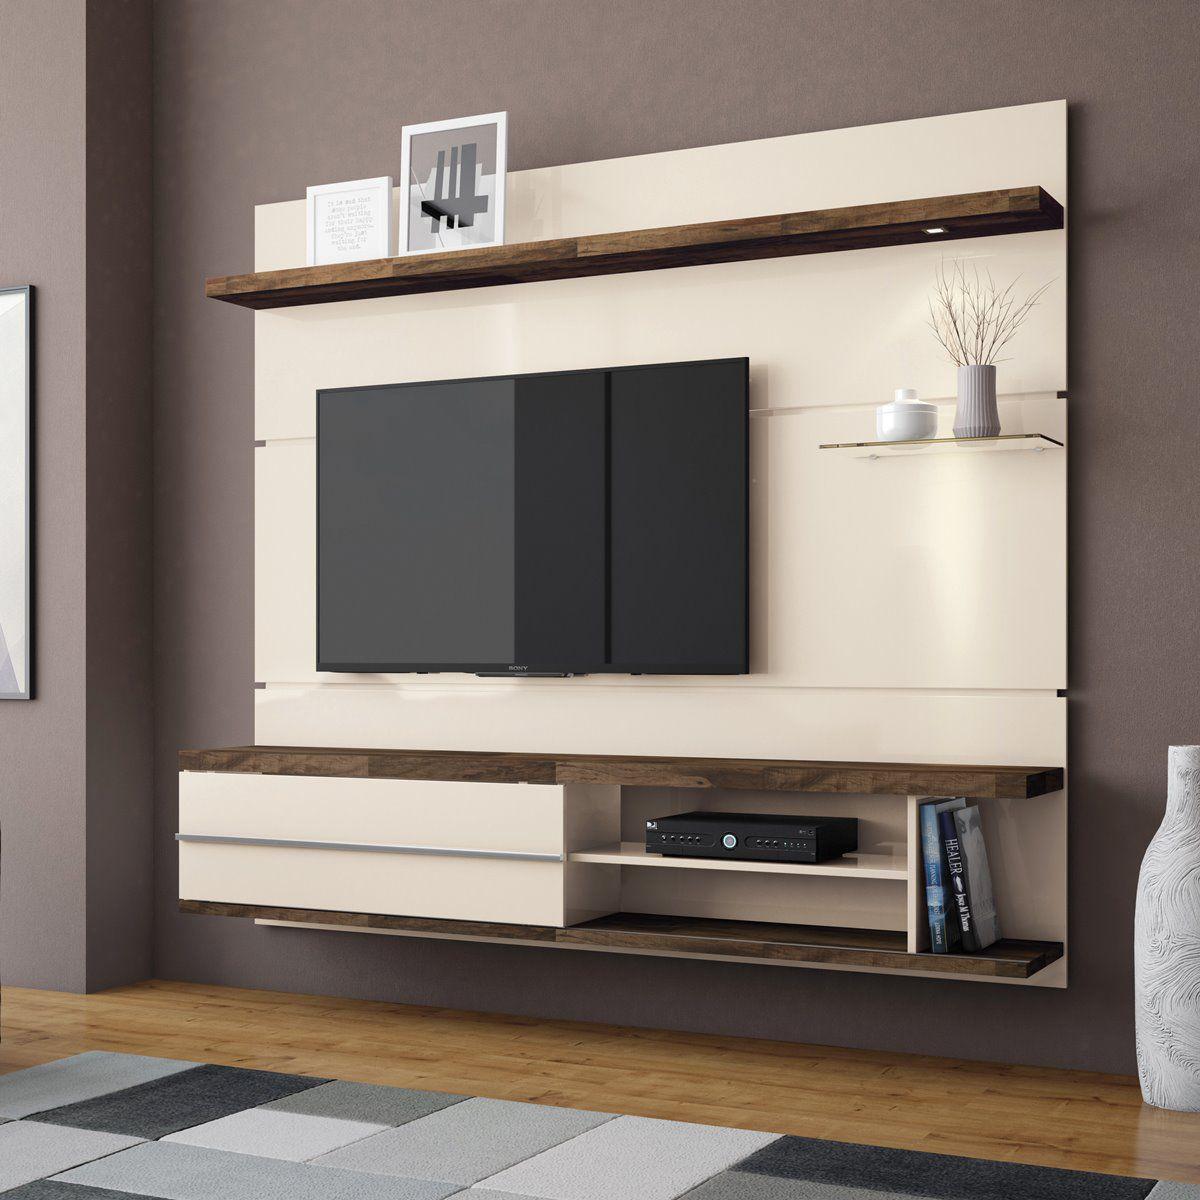 "Painel p/ TV 55"" Home Suspenso Epic HB Móveis Off White/Deck"